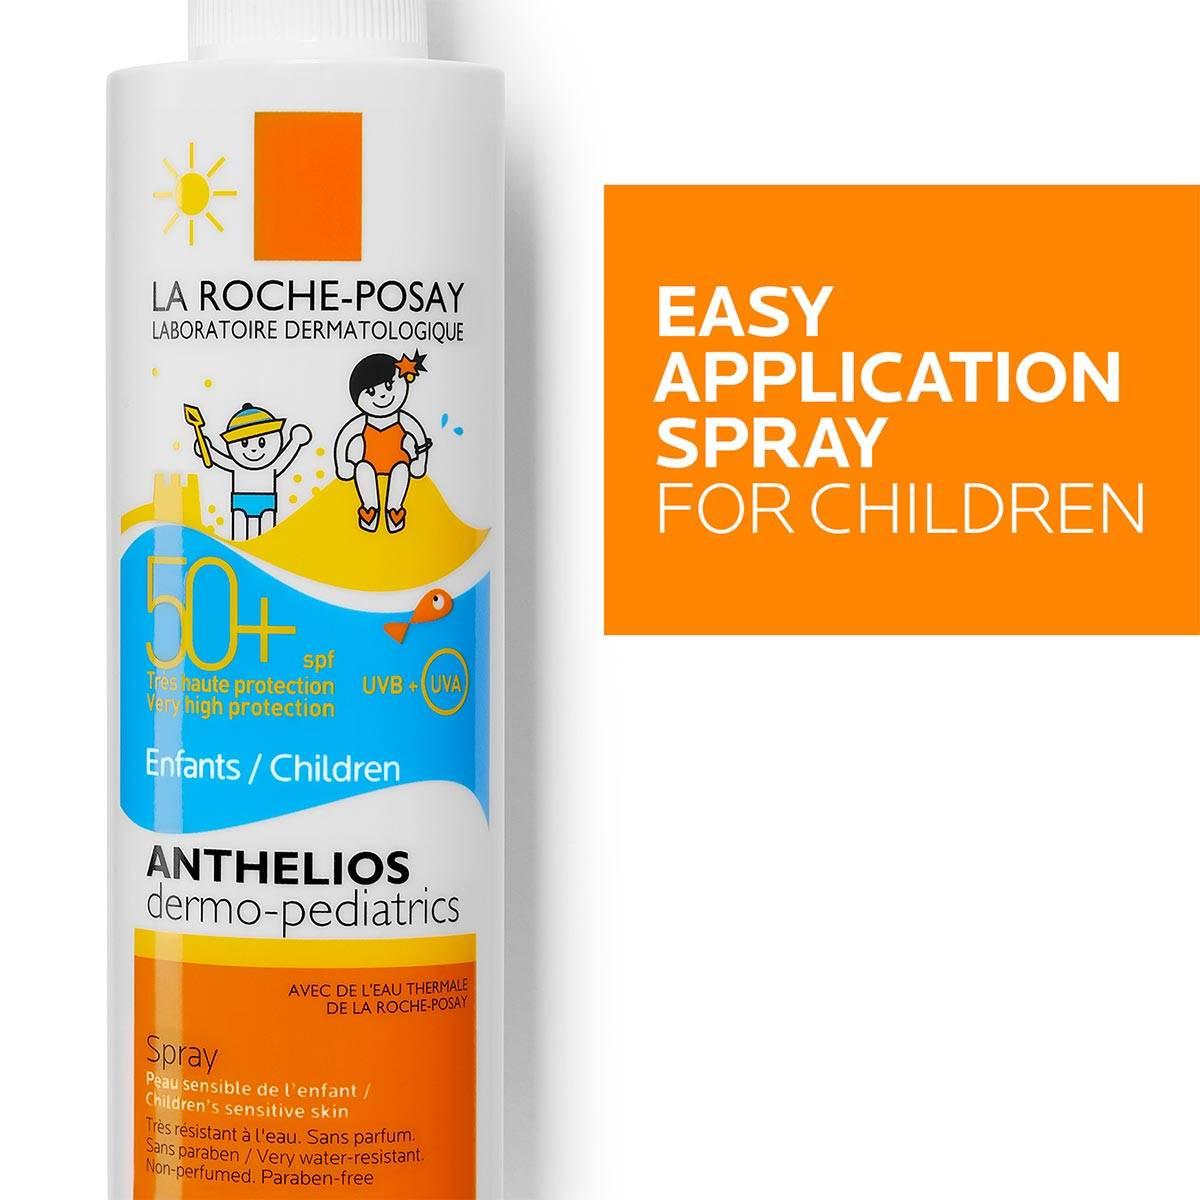 La Roche Posay ProductPage Sun Anthelios DP Spray Spf50 200ml 33378724